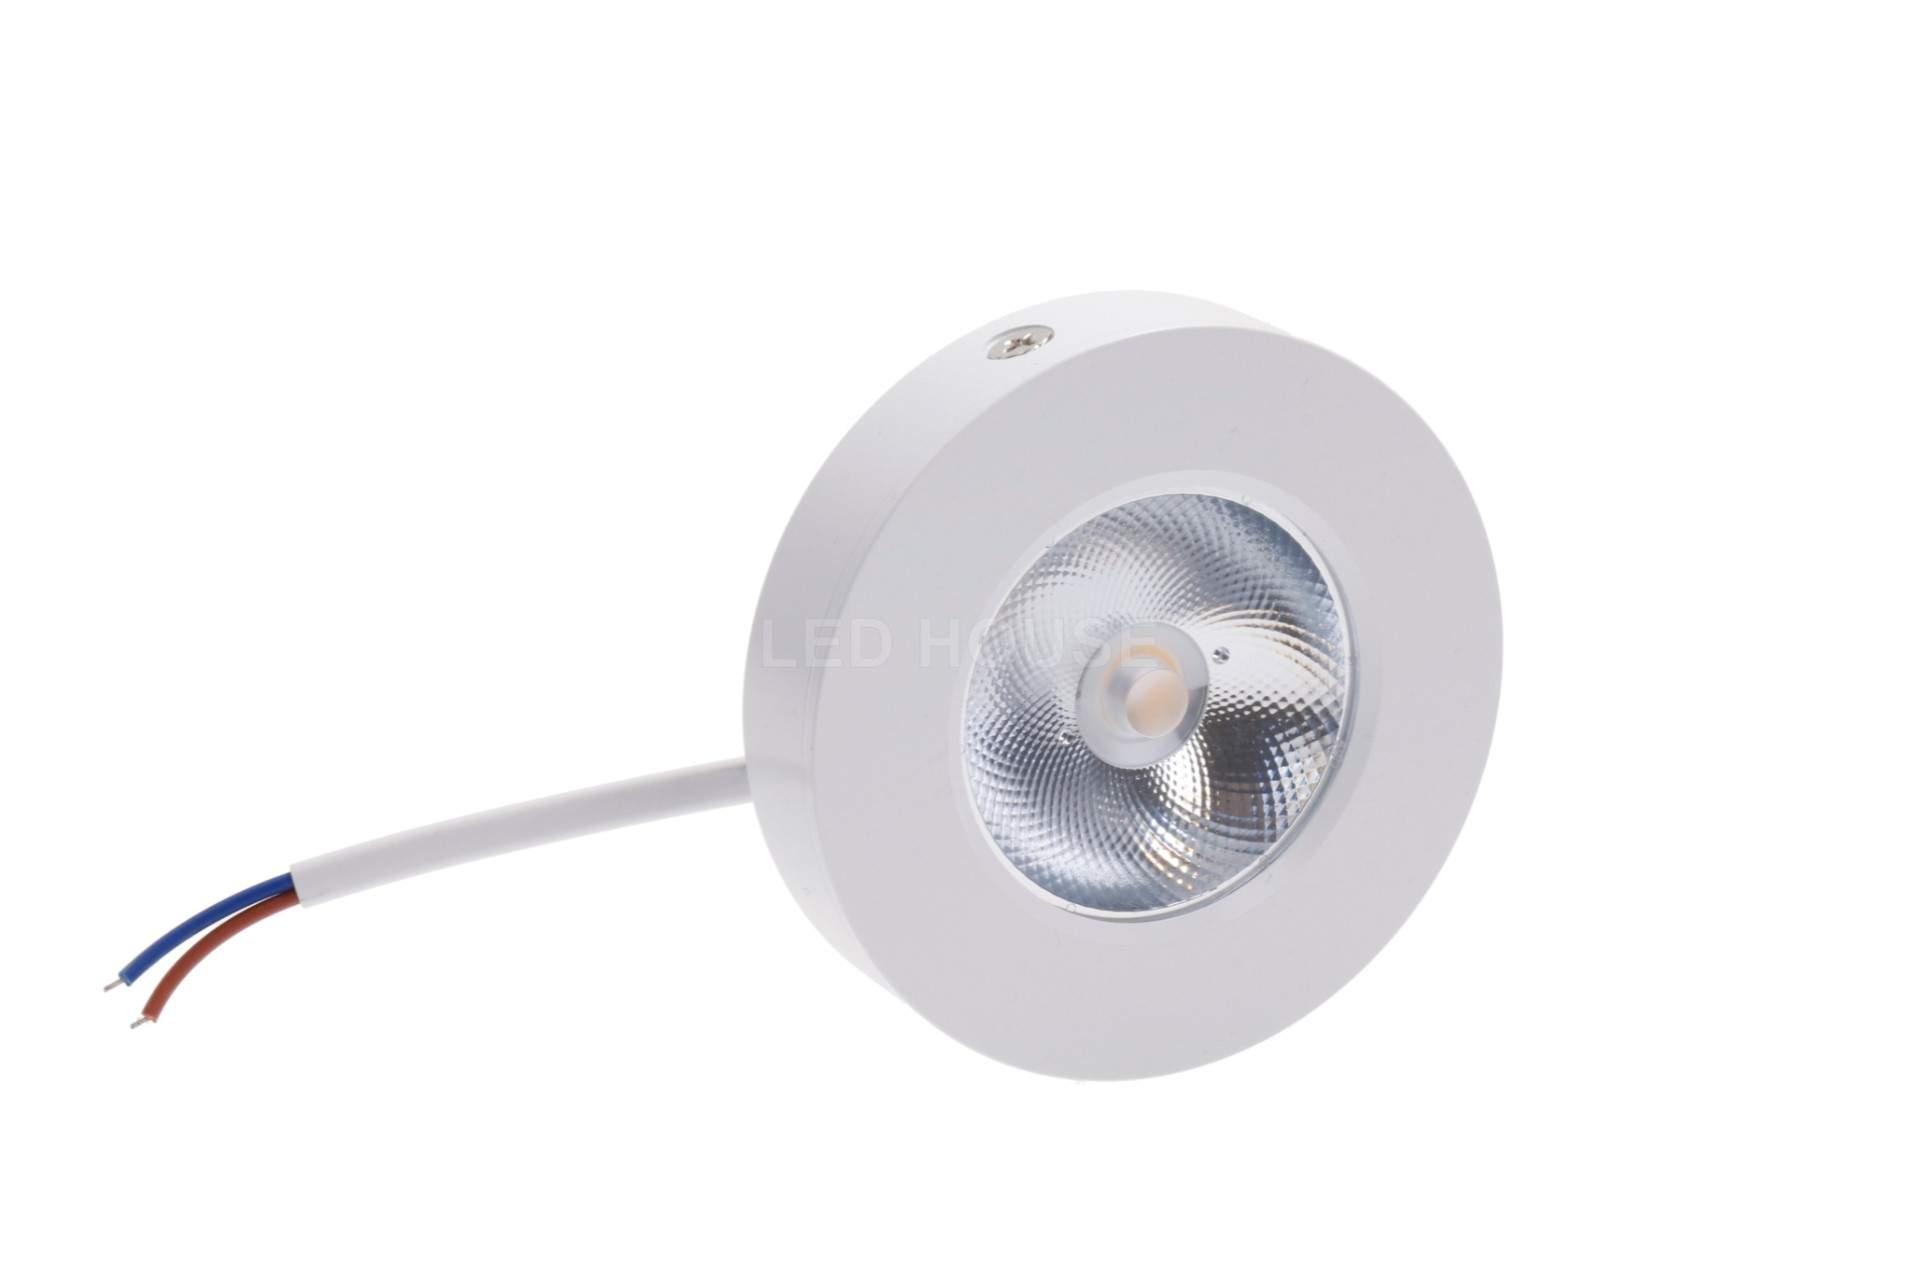 LED Mööblivalgusti REVAL BULB FD DIM valge ring 230V 5W 450lm CRI80 30° IP20 3000K soe valge